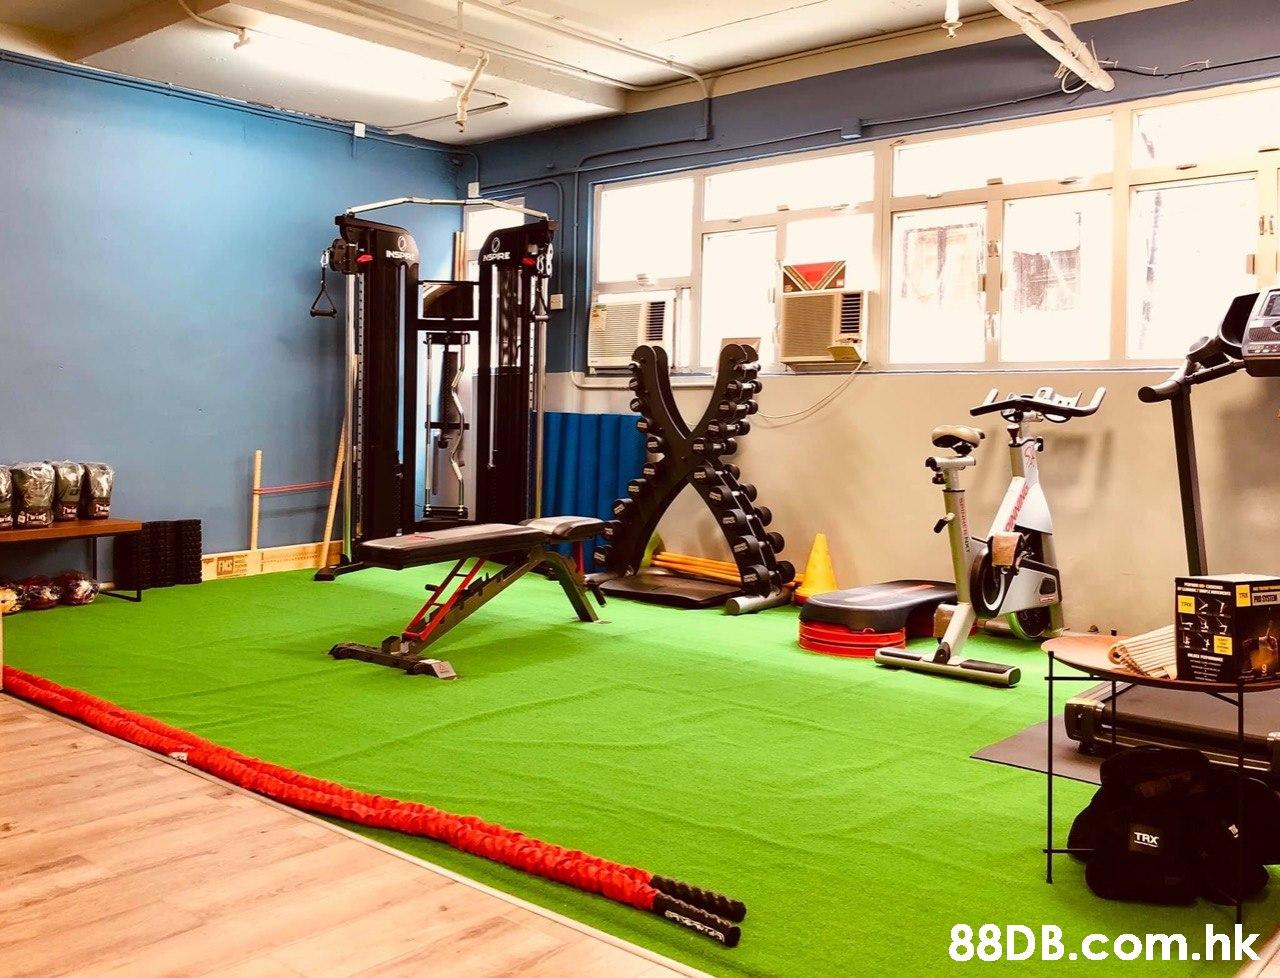 tis TRX .hk  Gym,Room,Flooring,Grass,Physical fitness